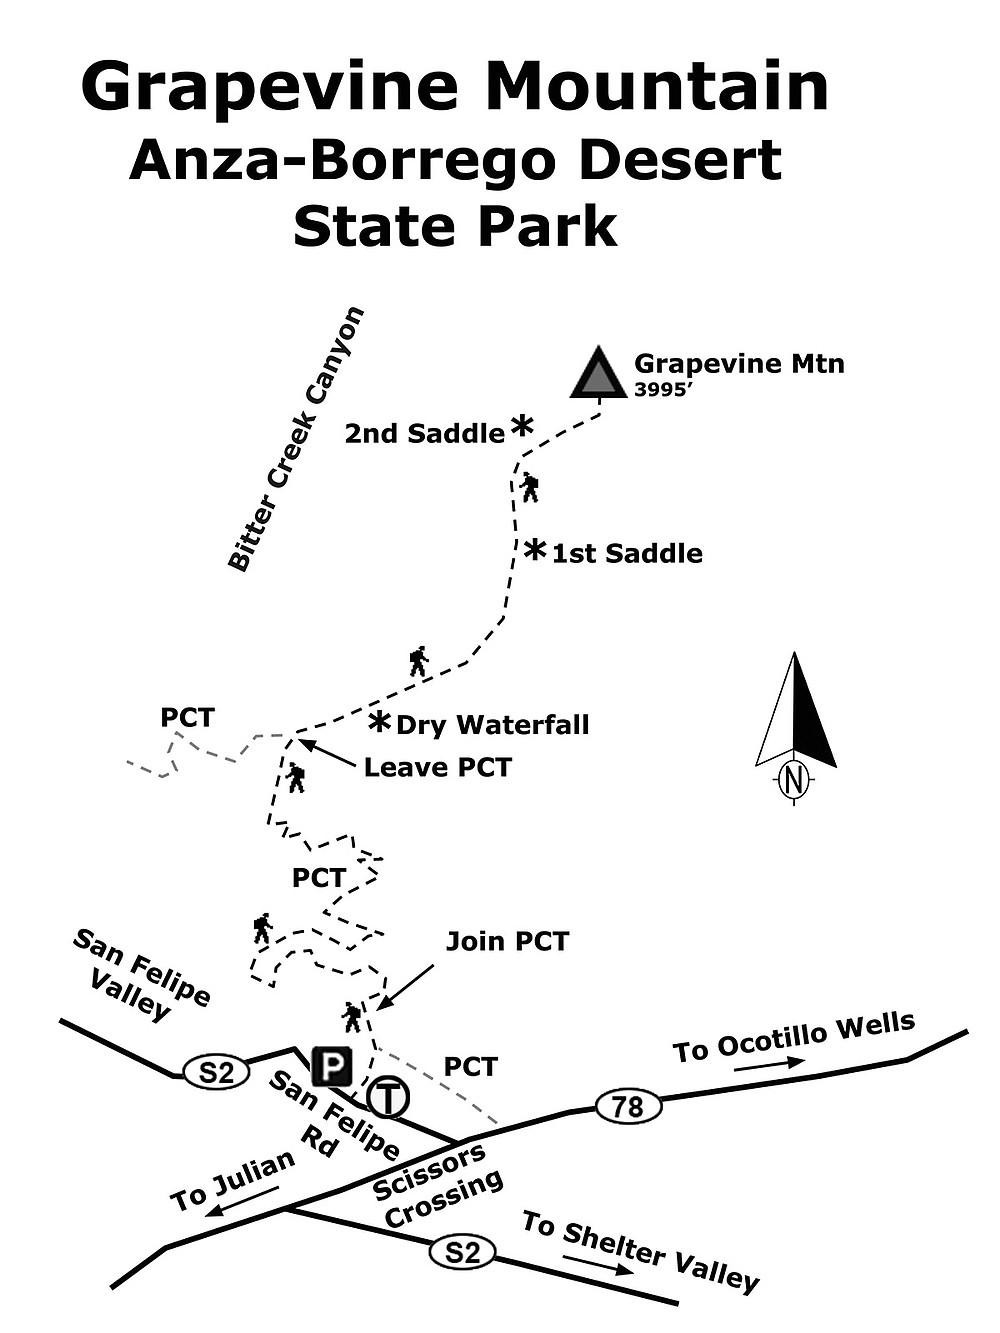 Grapevine Mountain map